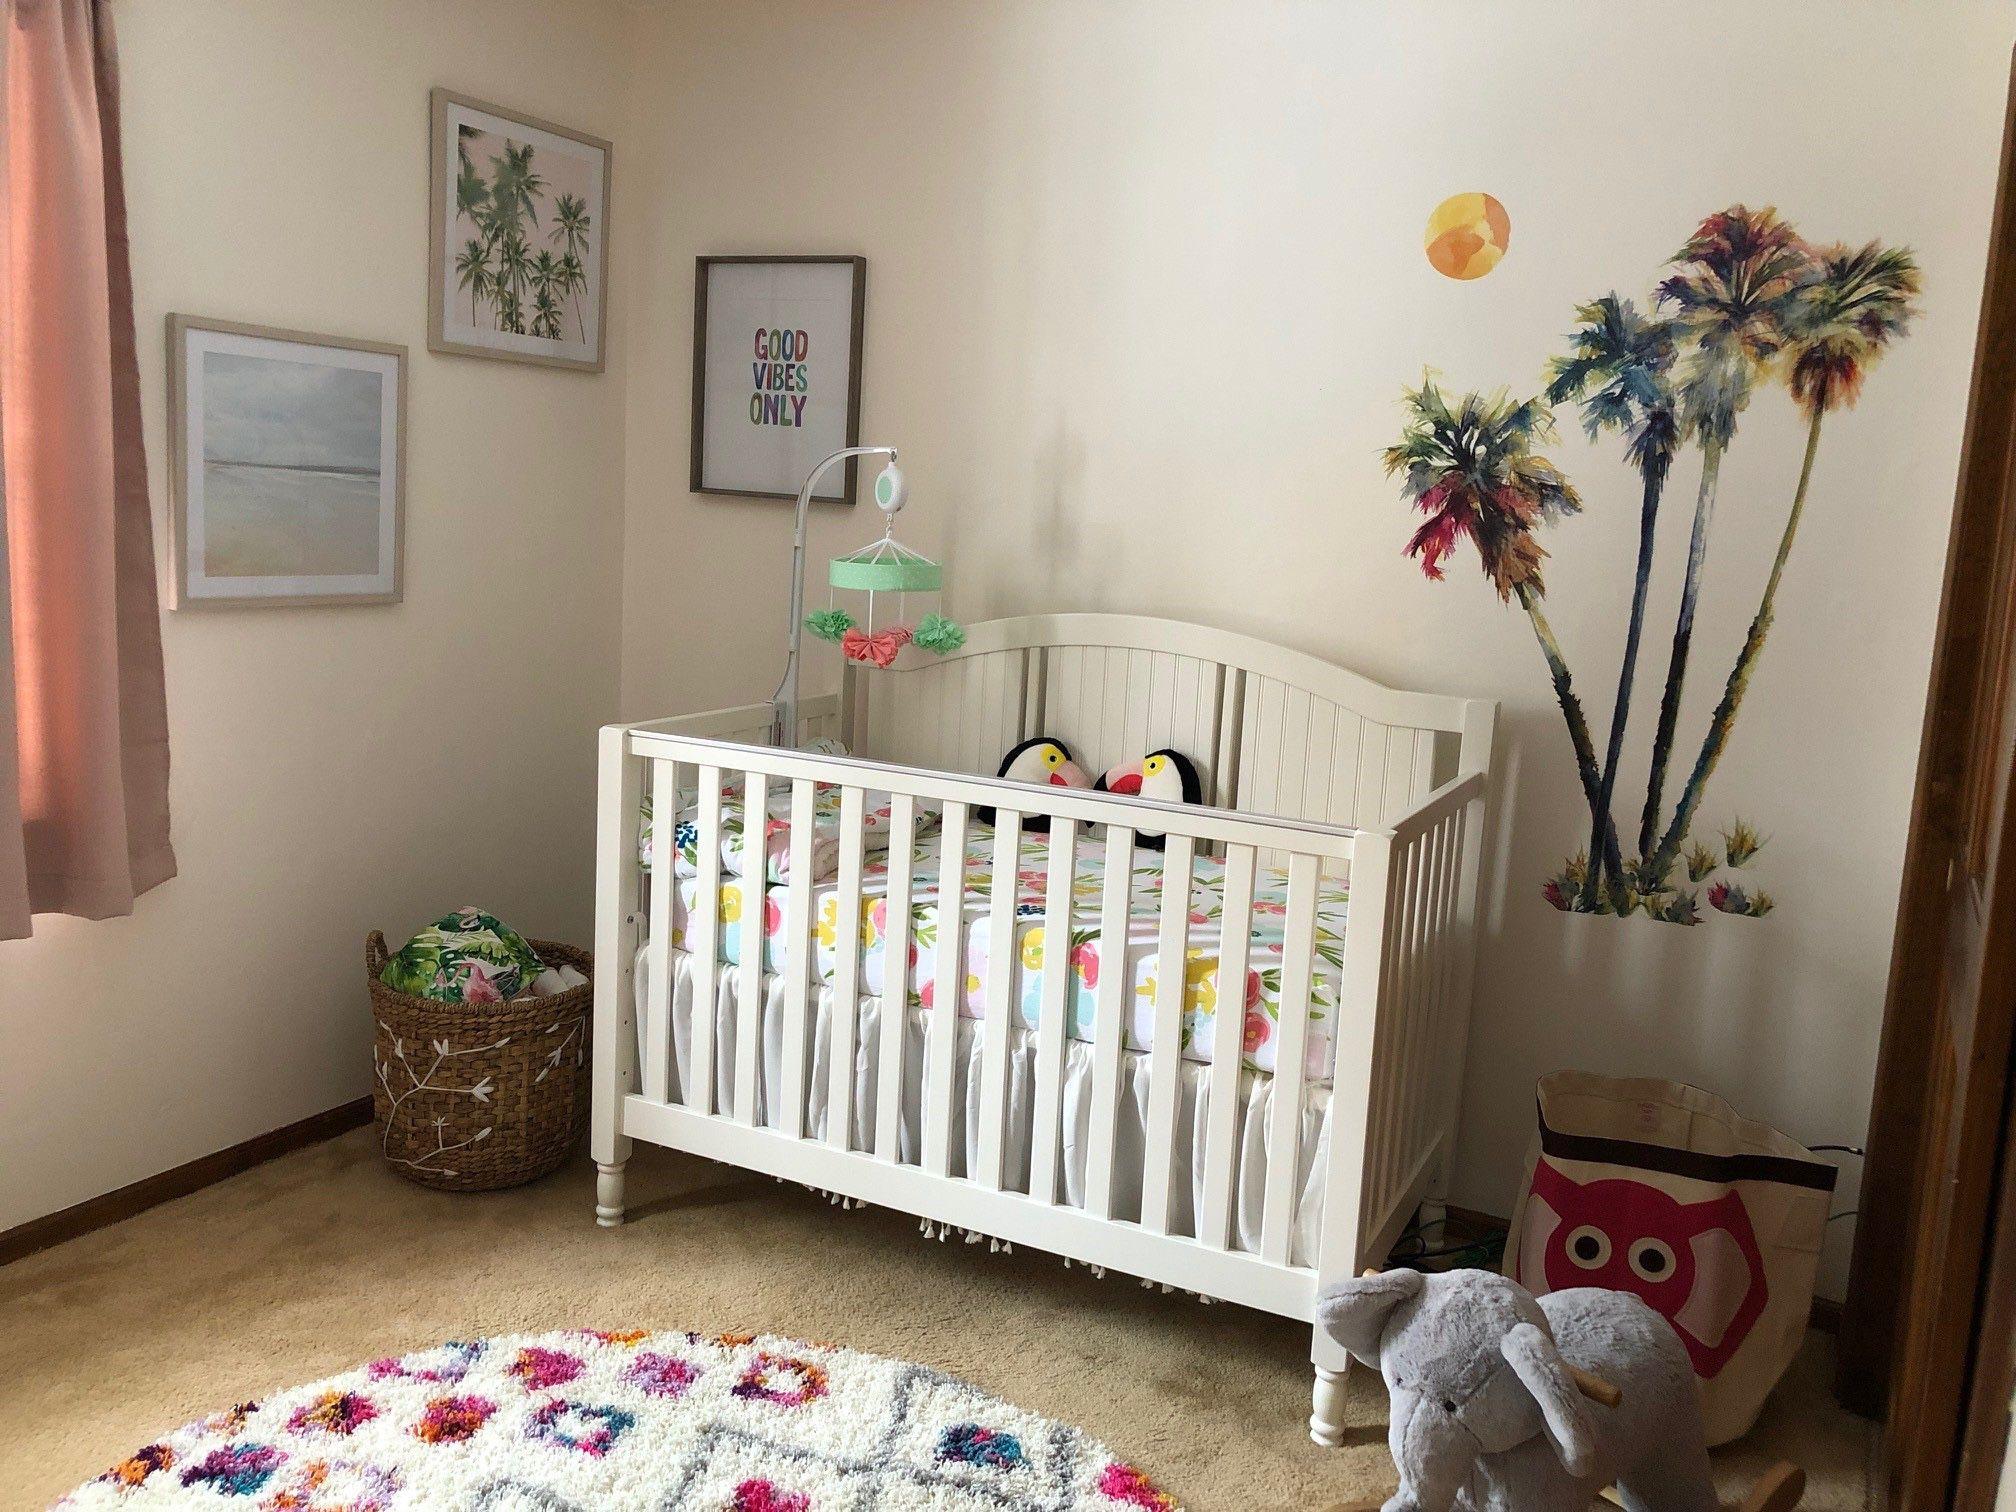 Pottery Barn Kids Crib w/ Mattress